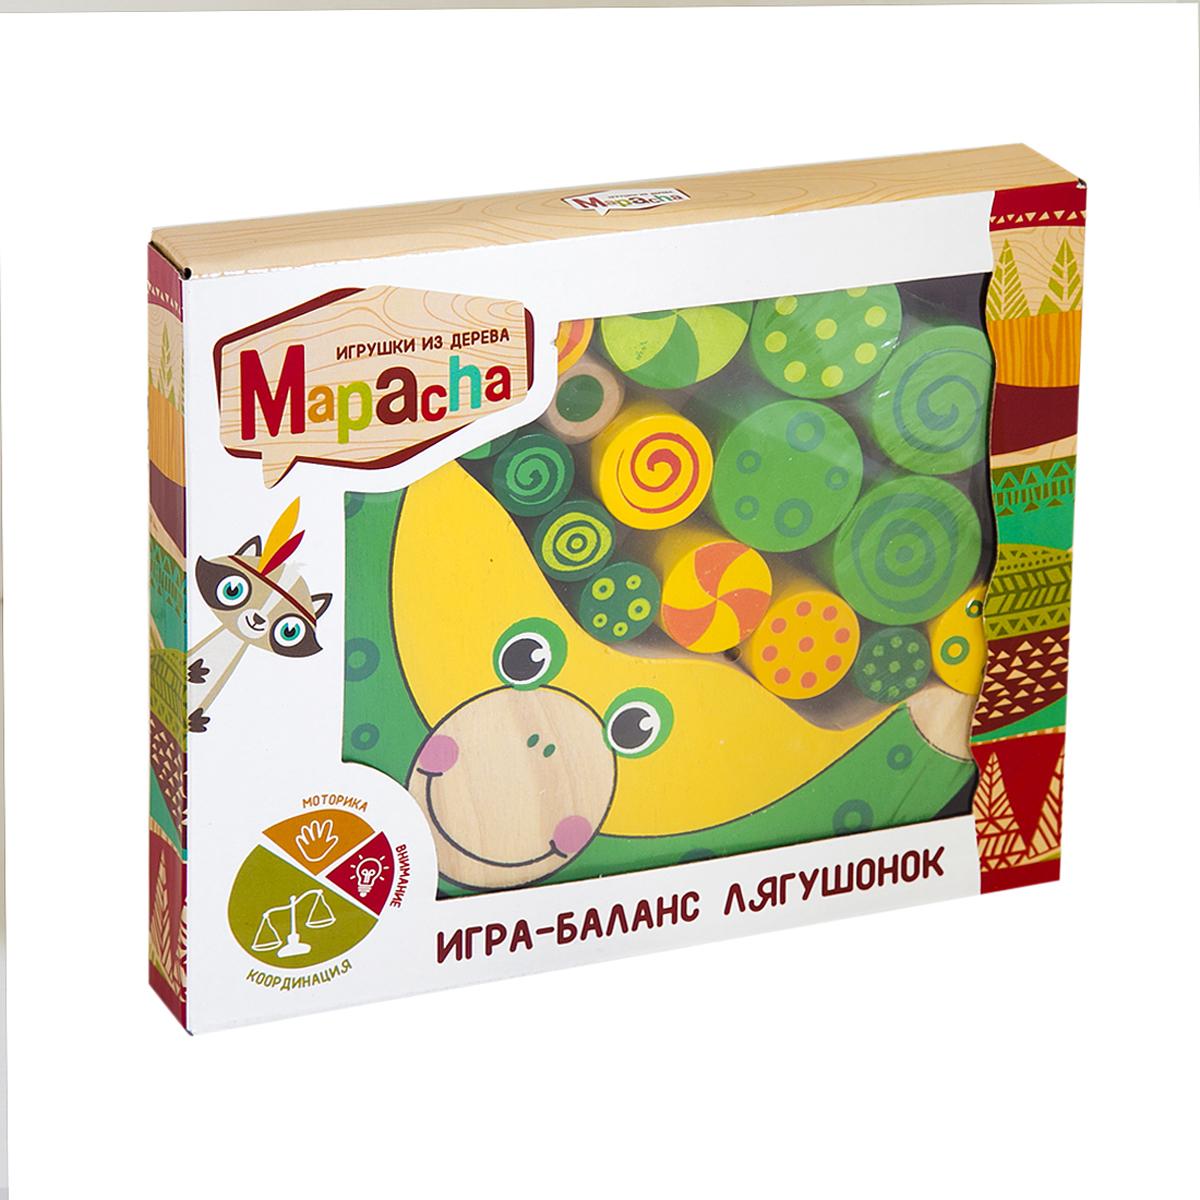 Mapacha Обучающая игра Баланс Лягушонок фигурки игрушки prostotoys игрок 5 метеор шайбу шайбу